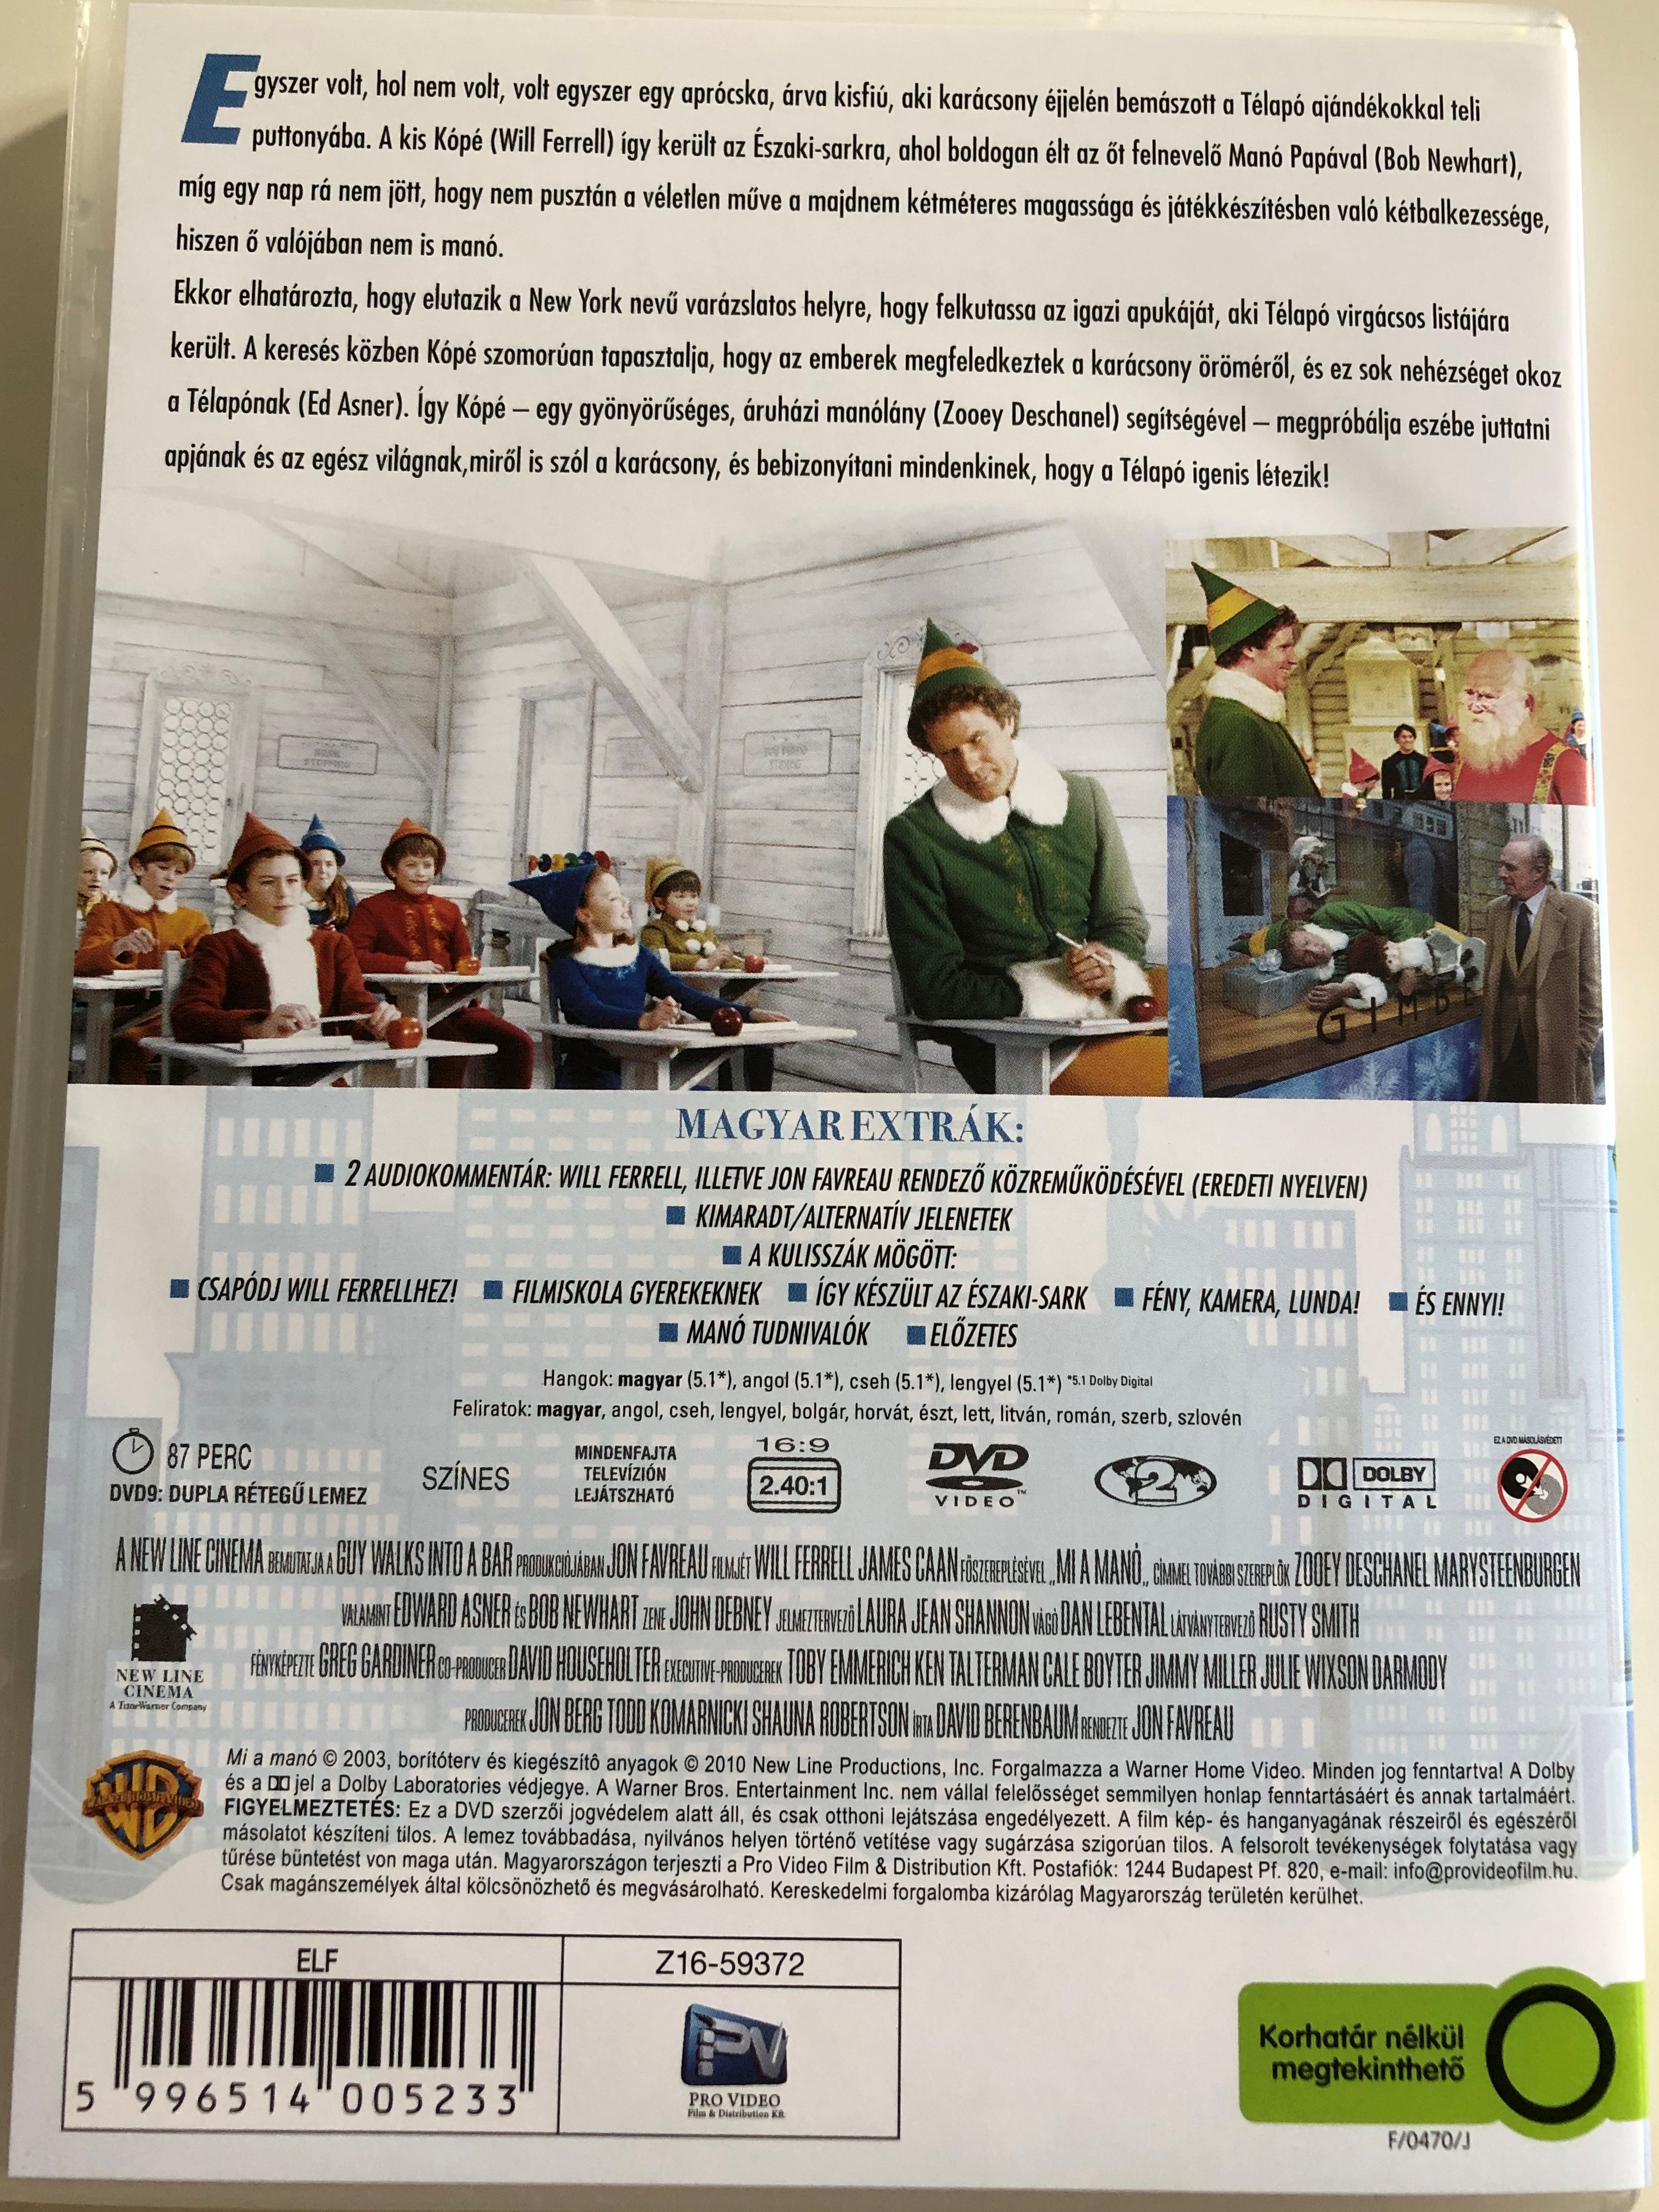 elf-dvd-2003-mi-a-man-directed-by-jon-favreau-starring-will-ferrell-james-caan-zooey-deschanel-mary-steenburgen-daniel-tay-bob-newhart-edward-asner-2-.jpg